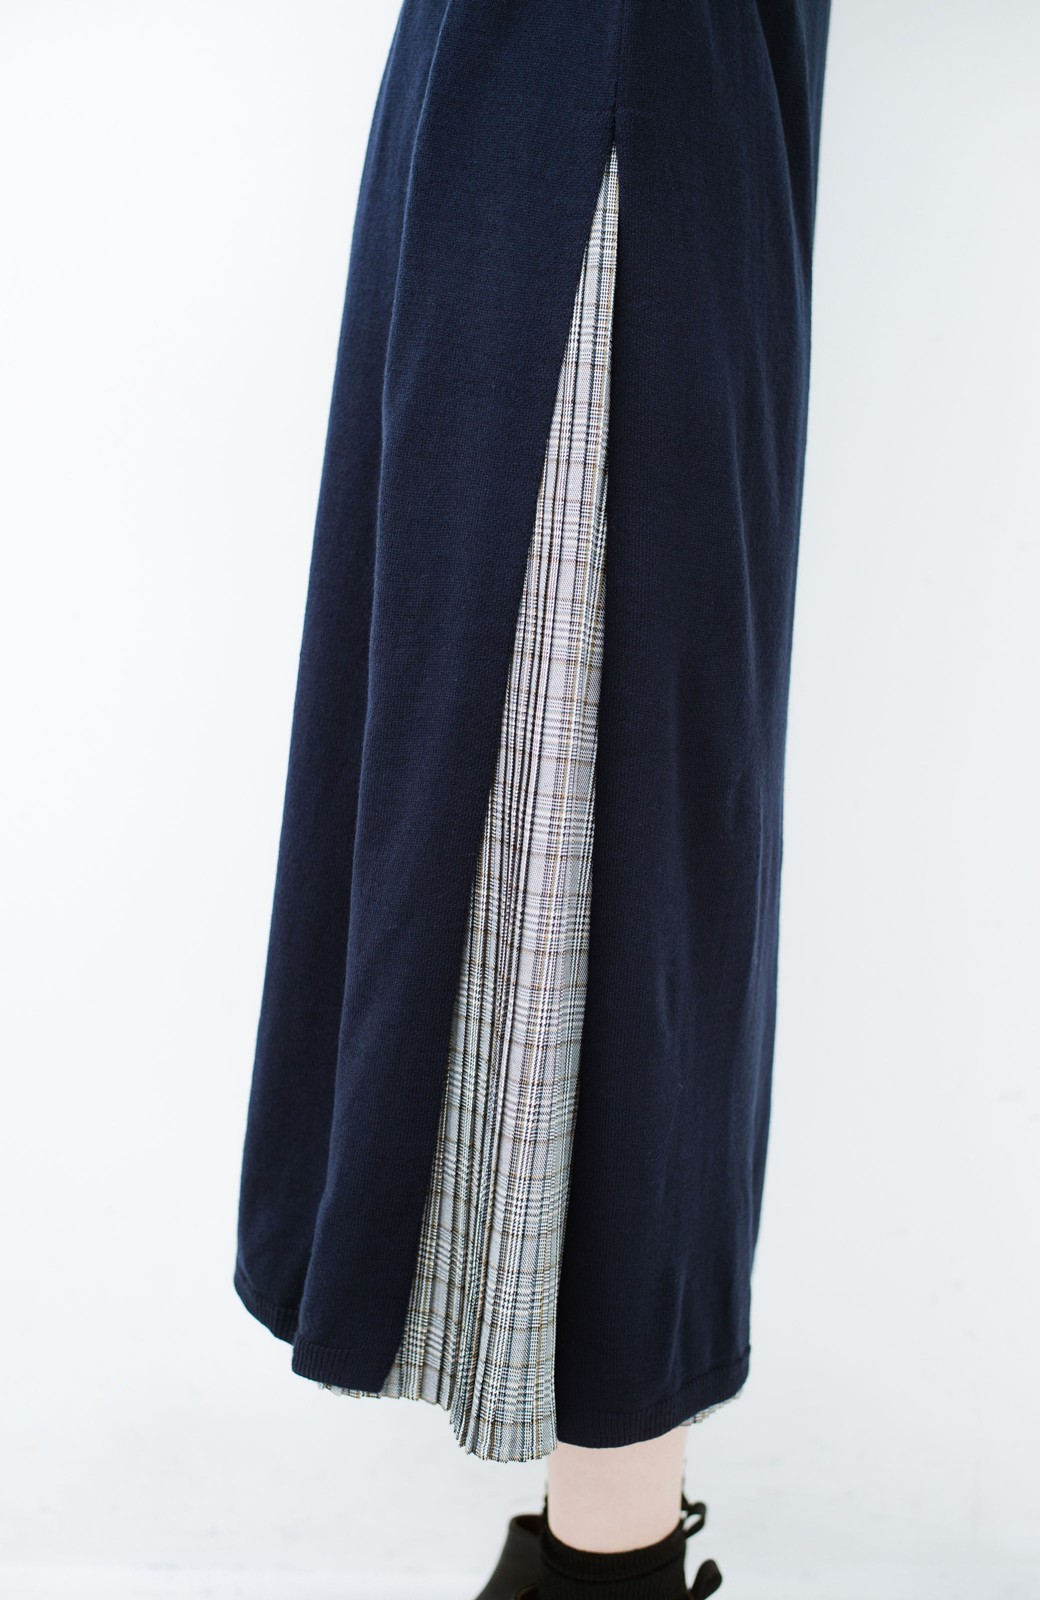 haco! 着こなし無限!自由自在なスリットロングニットとチェックプリーツスカートとチュール巻きスカートの3点セット <ネイビー>の商品写真8